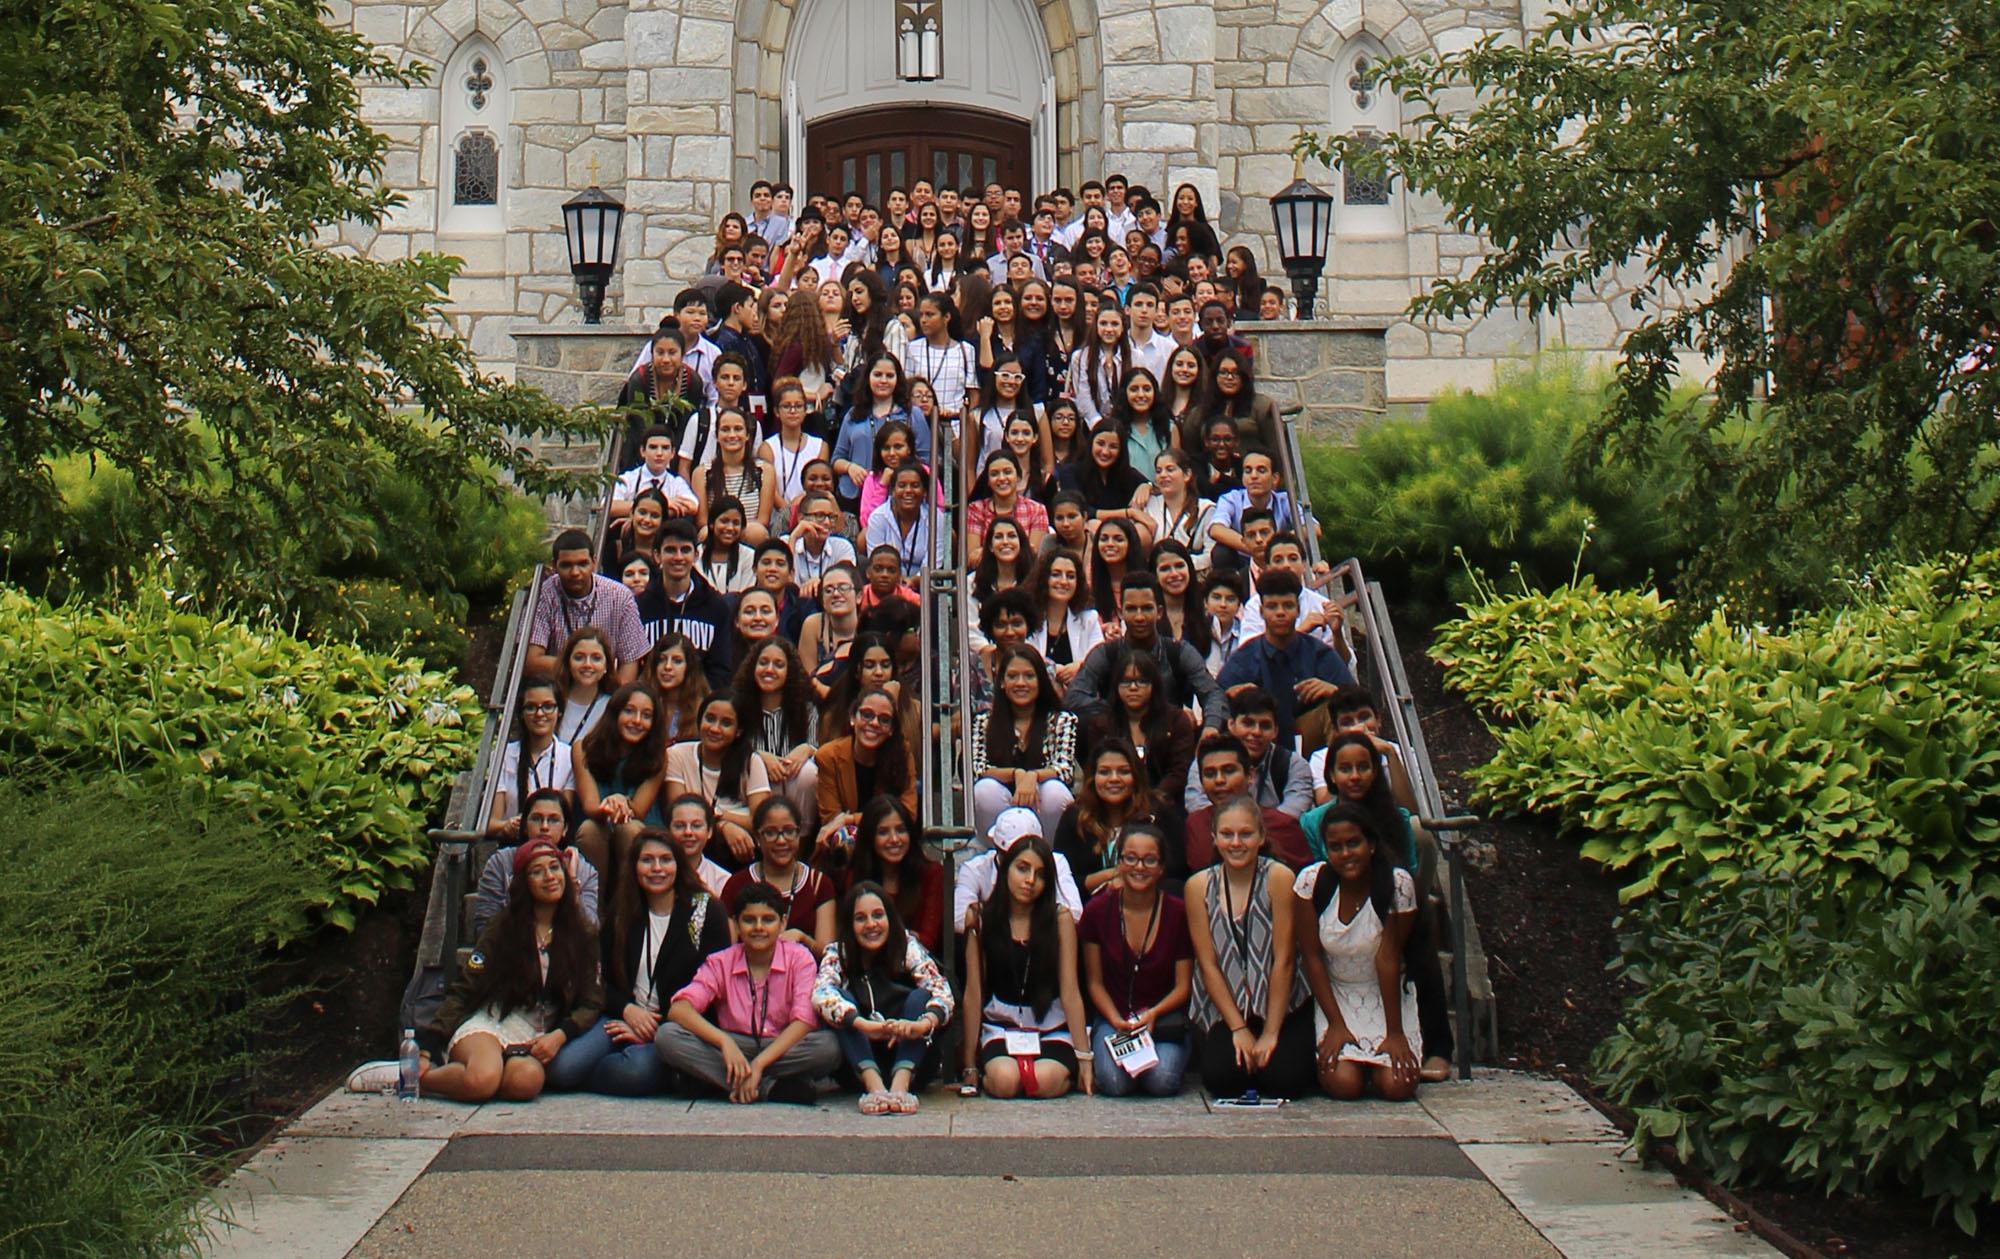 2017 Northeast Great Debate students at Villanova University